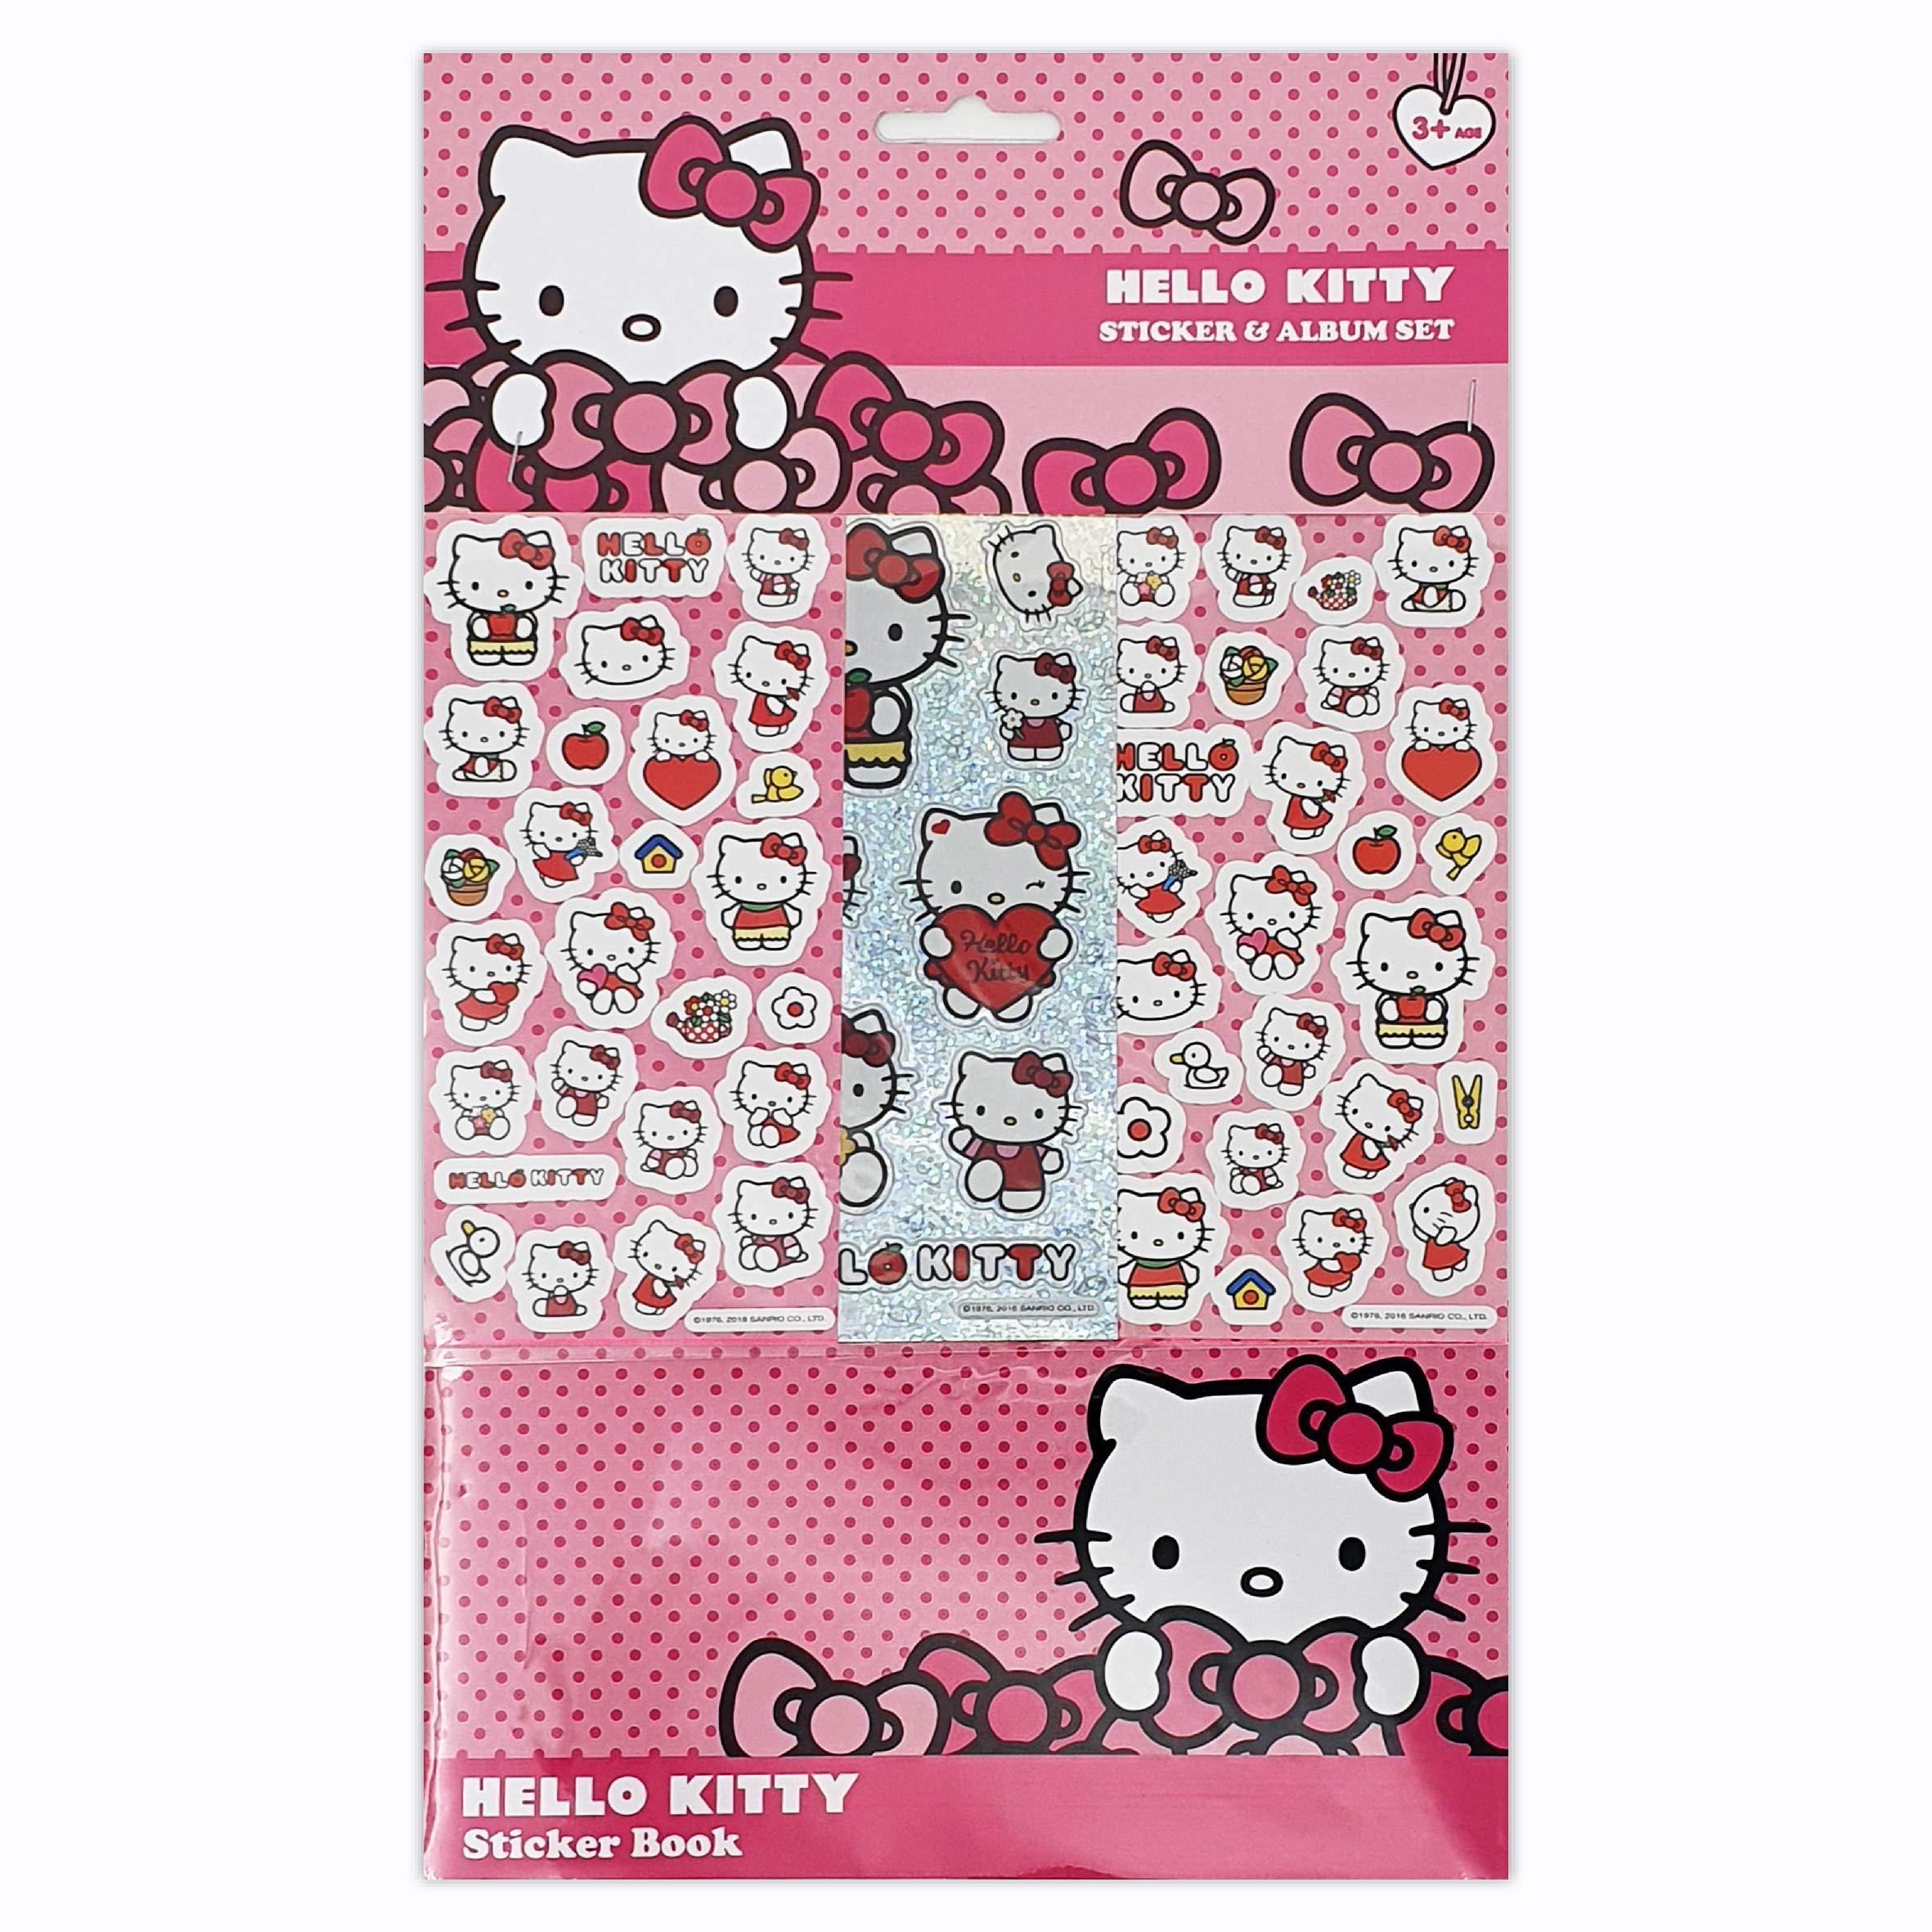 Hello Kitty Sticker Album 6 Sheets